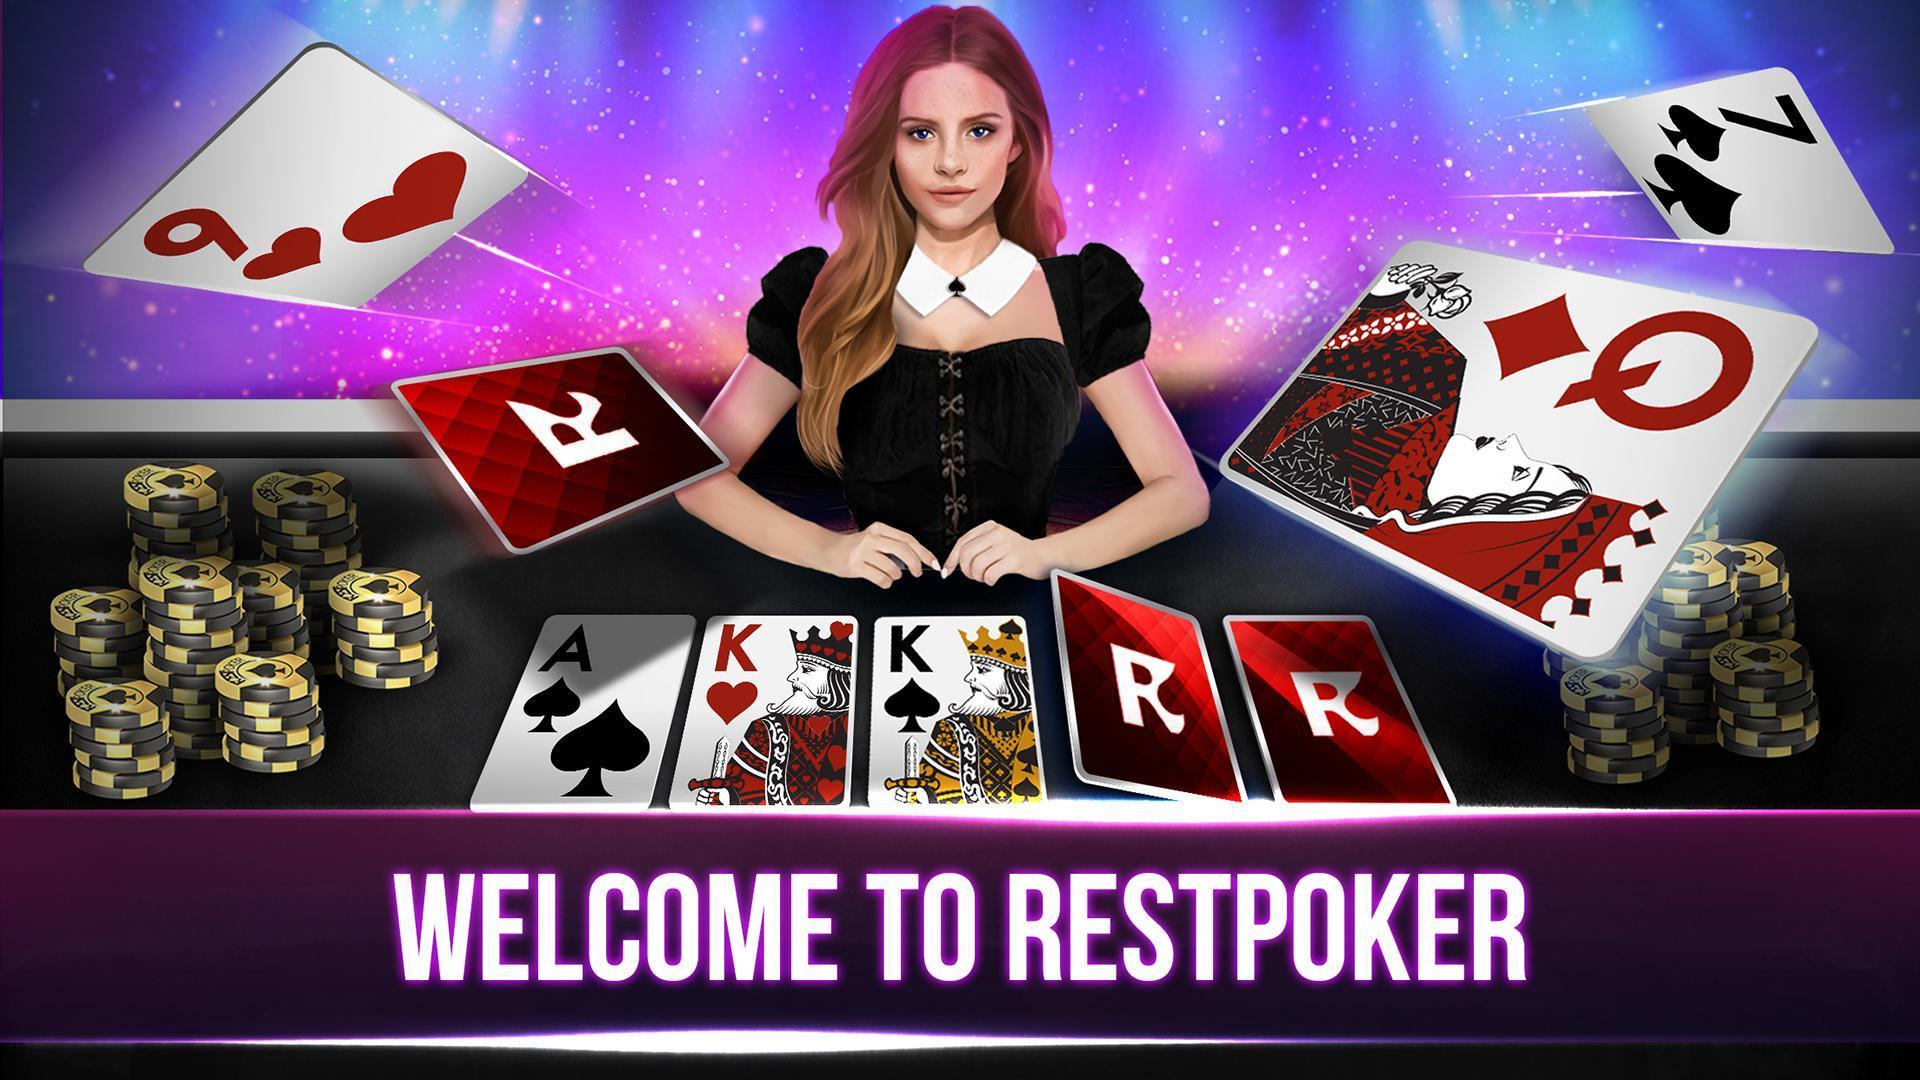 Free software texas poker pokerist chip hack download